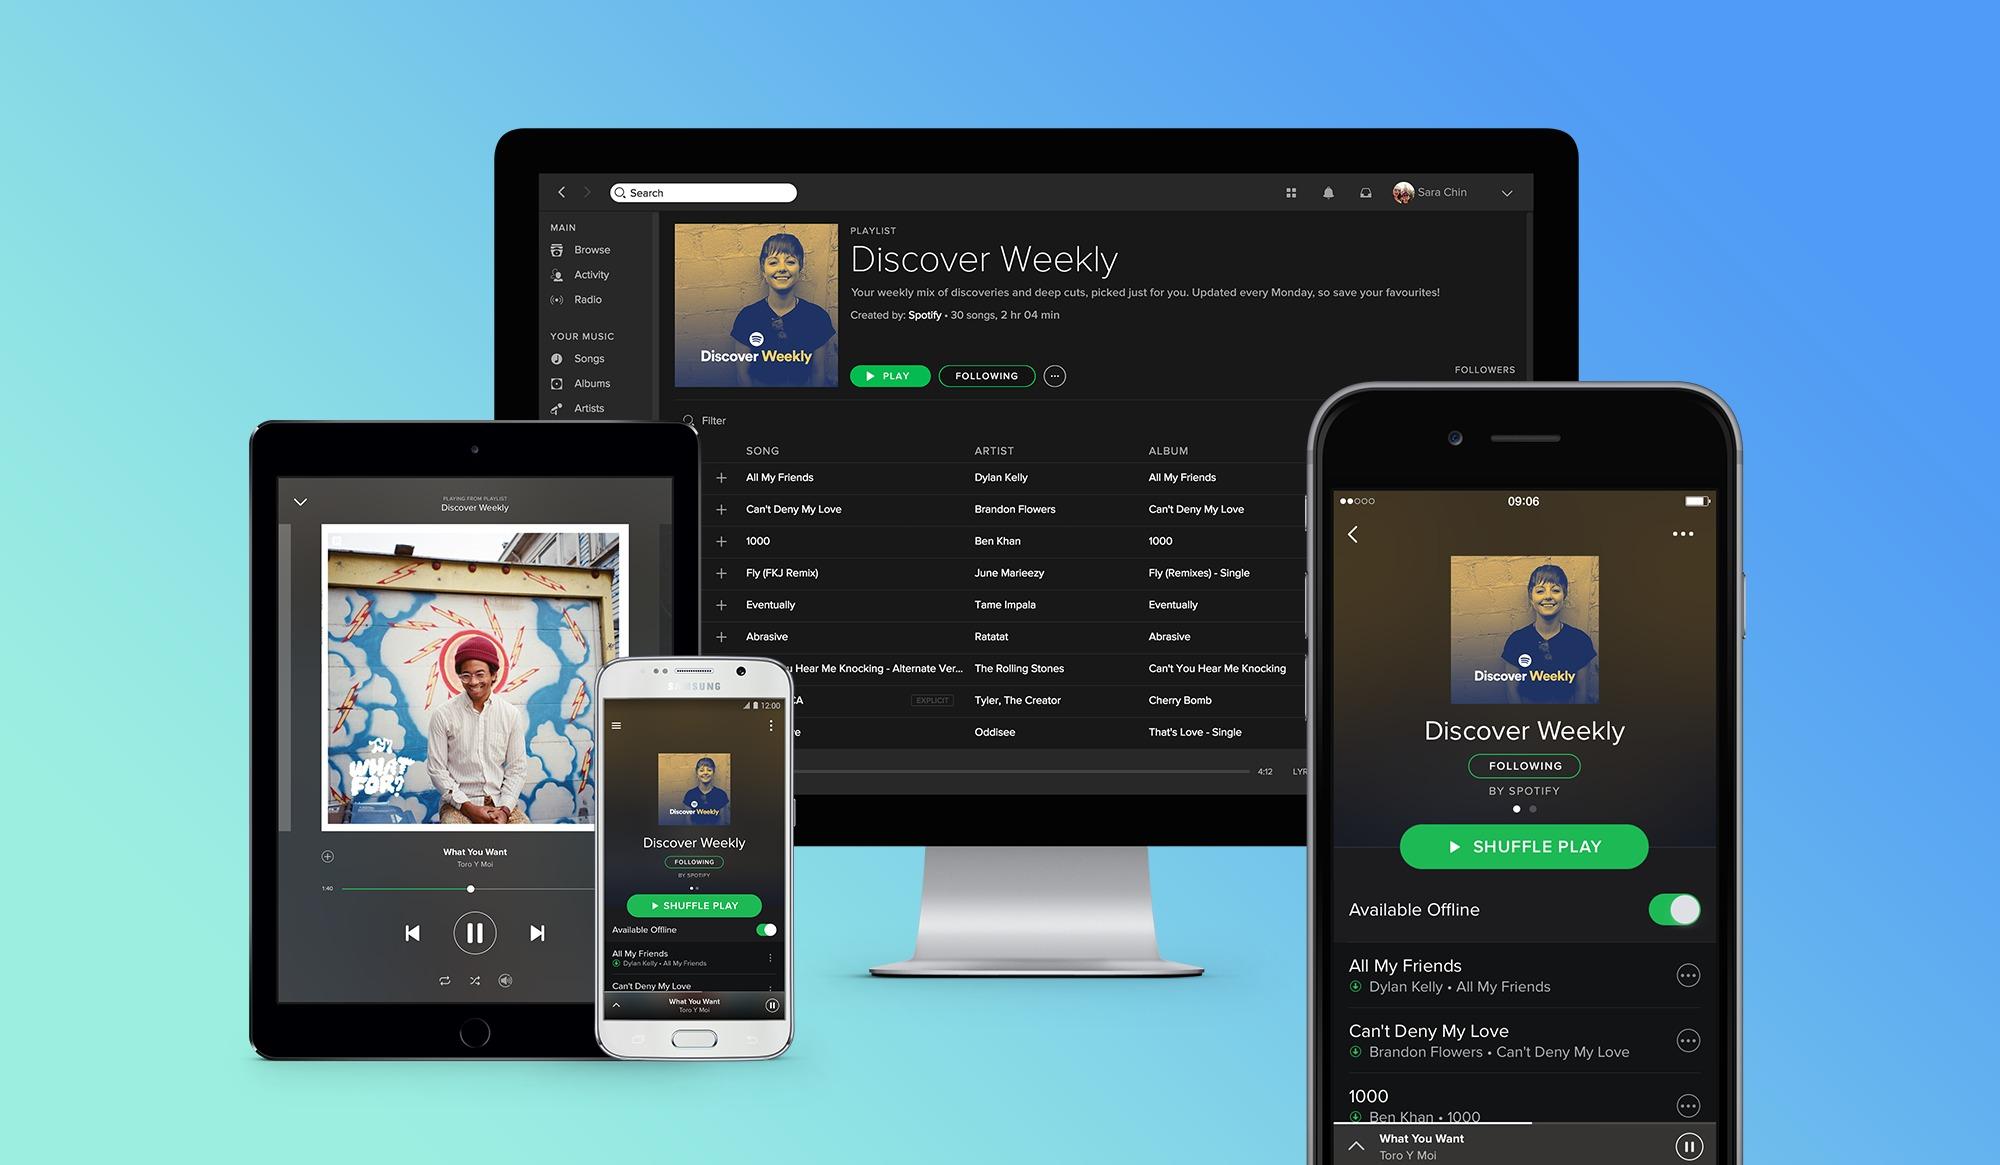 Nå kan seks familiemedlemmer dele samme Spotify-abonnement.